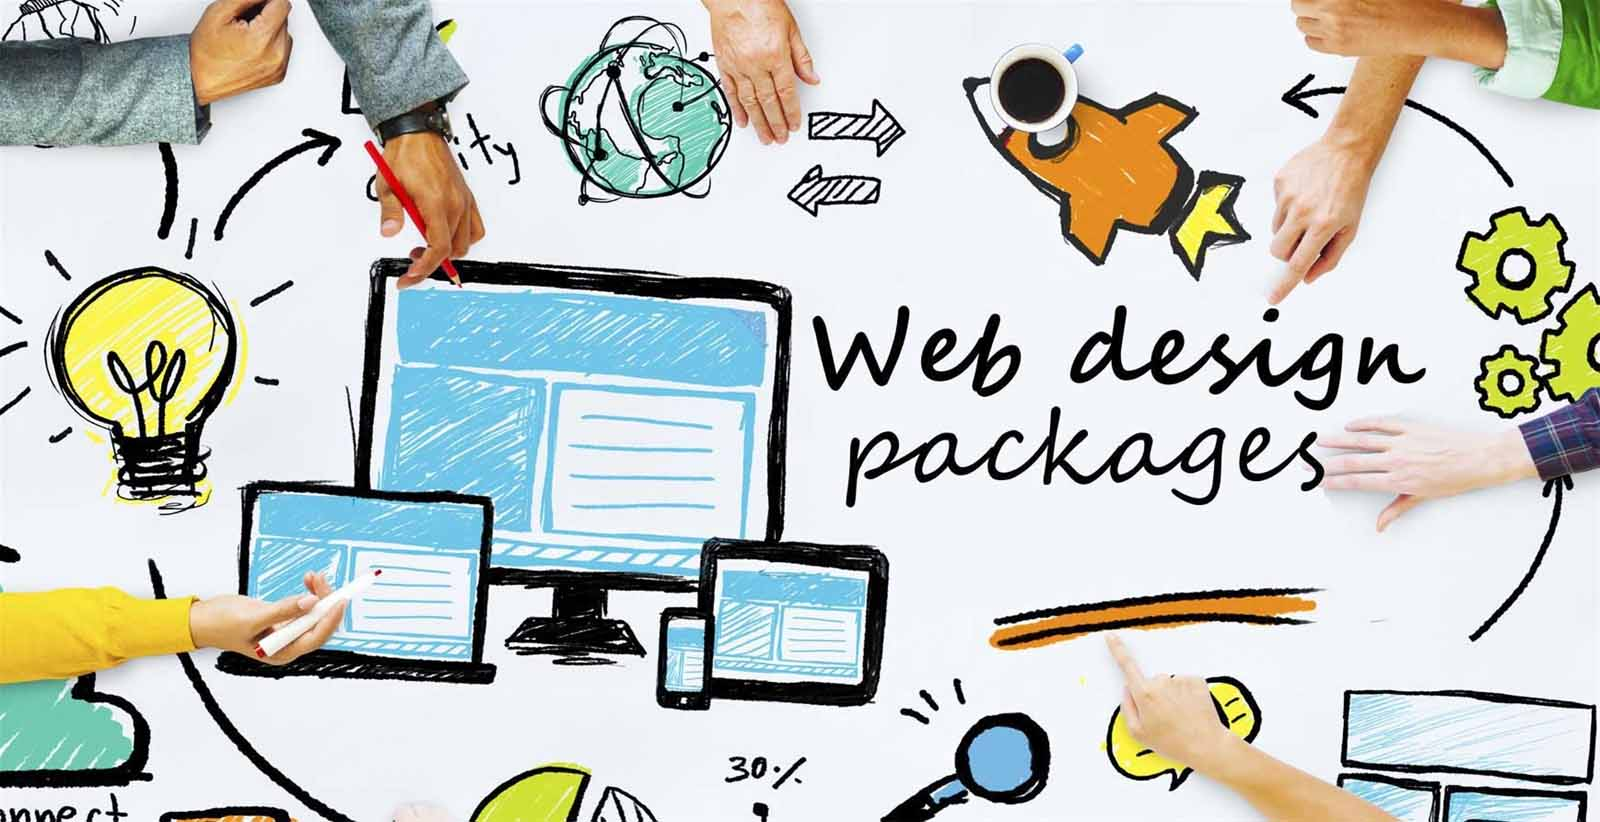 thiết kế website marketing